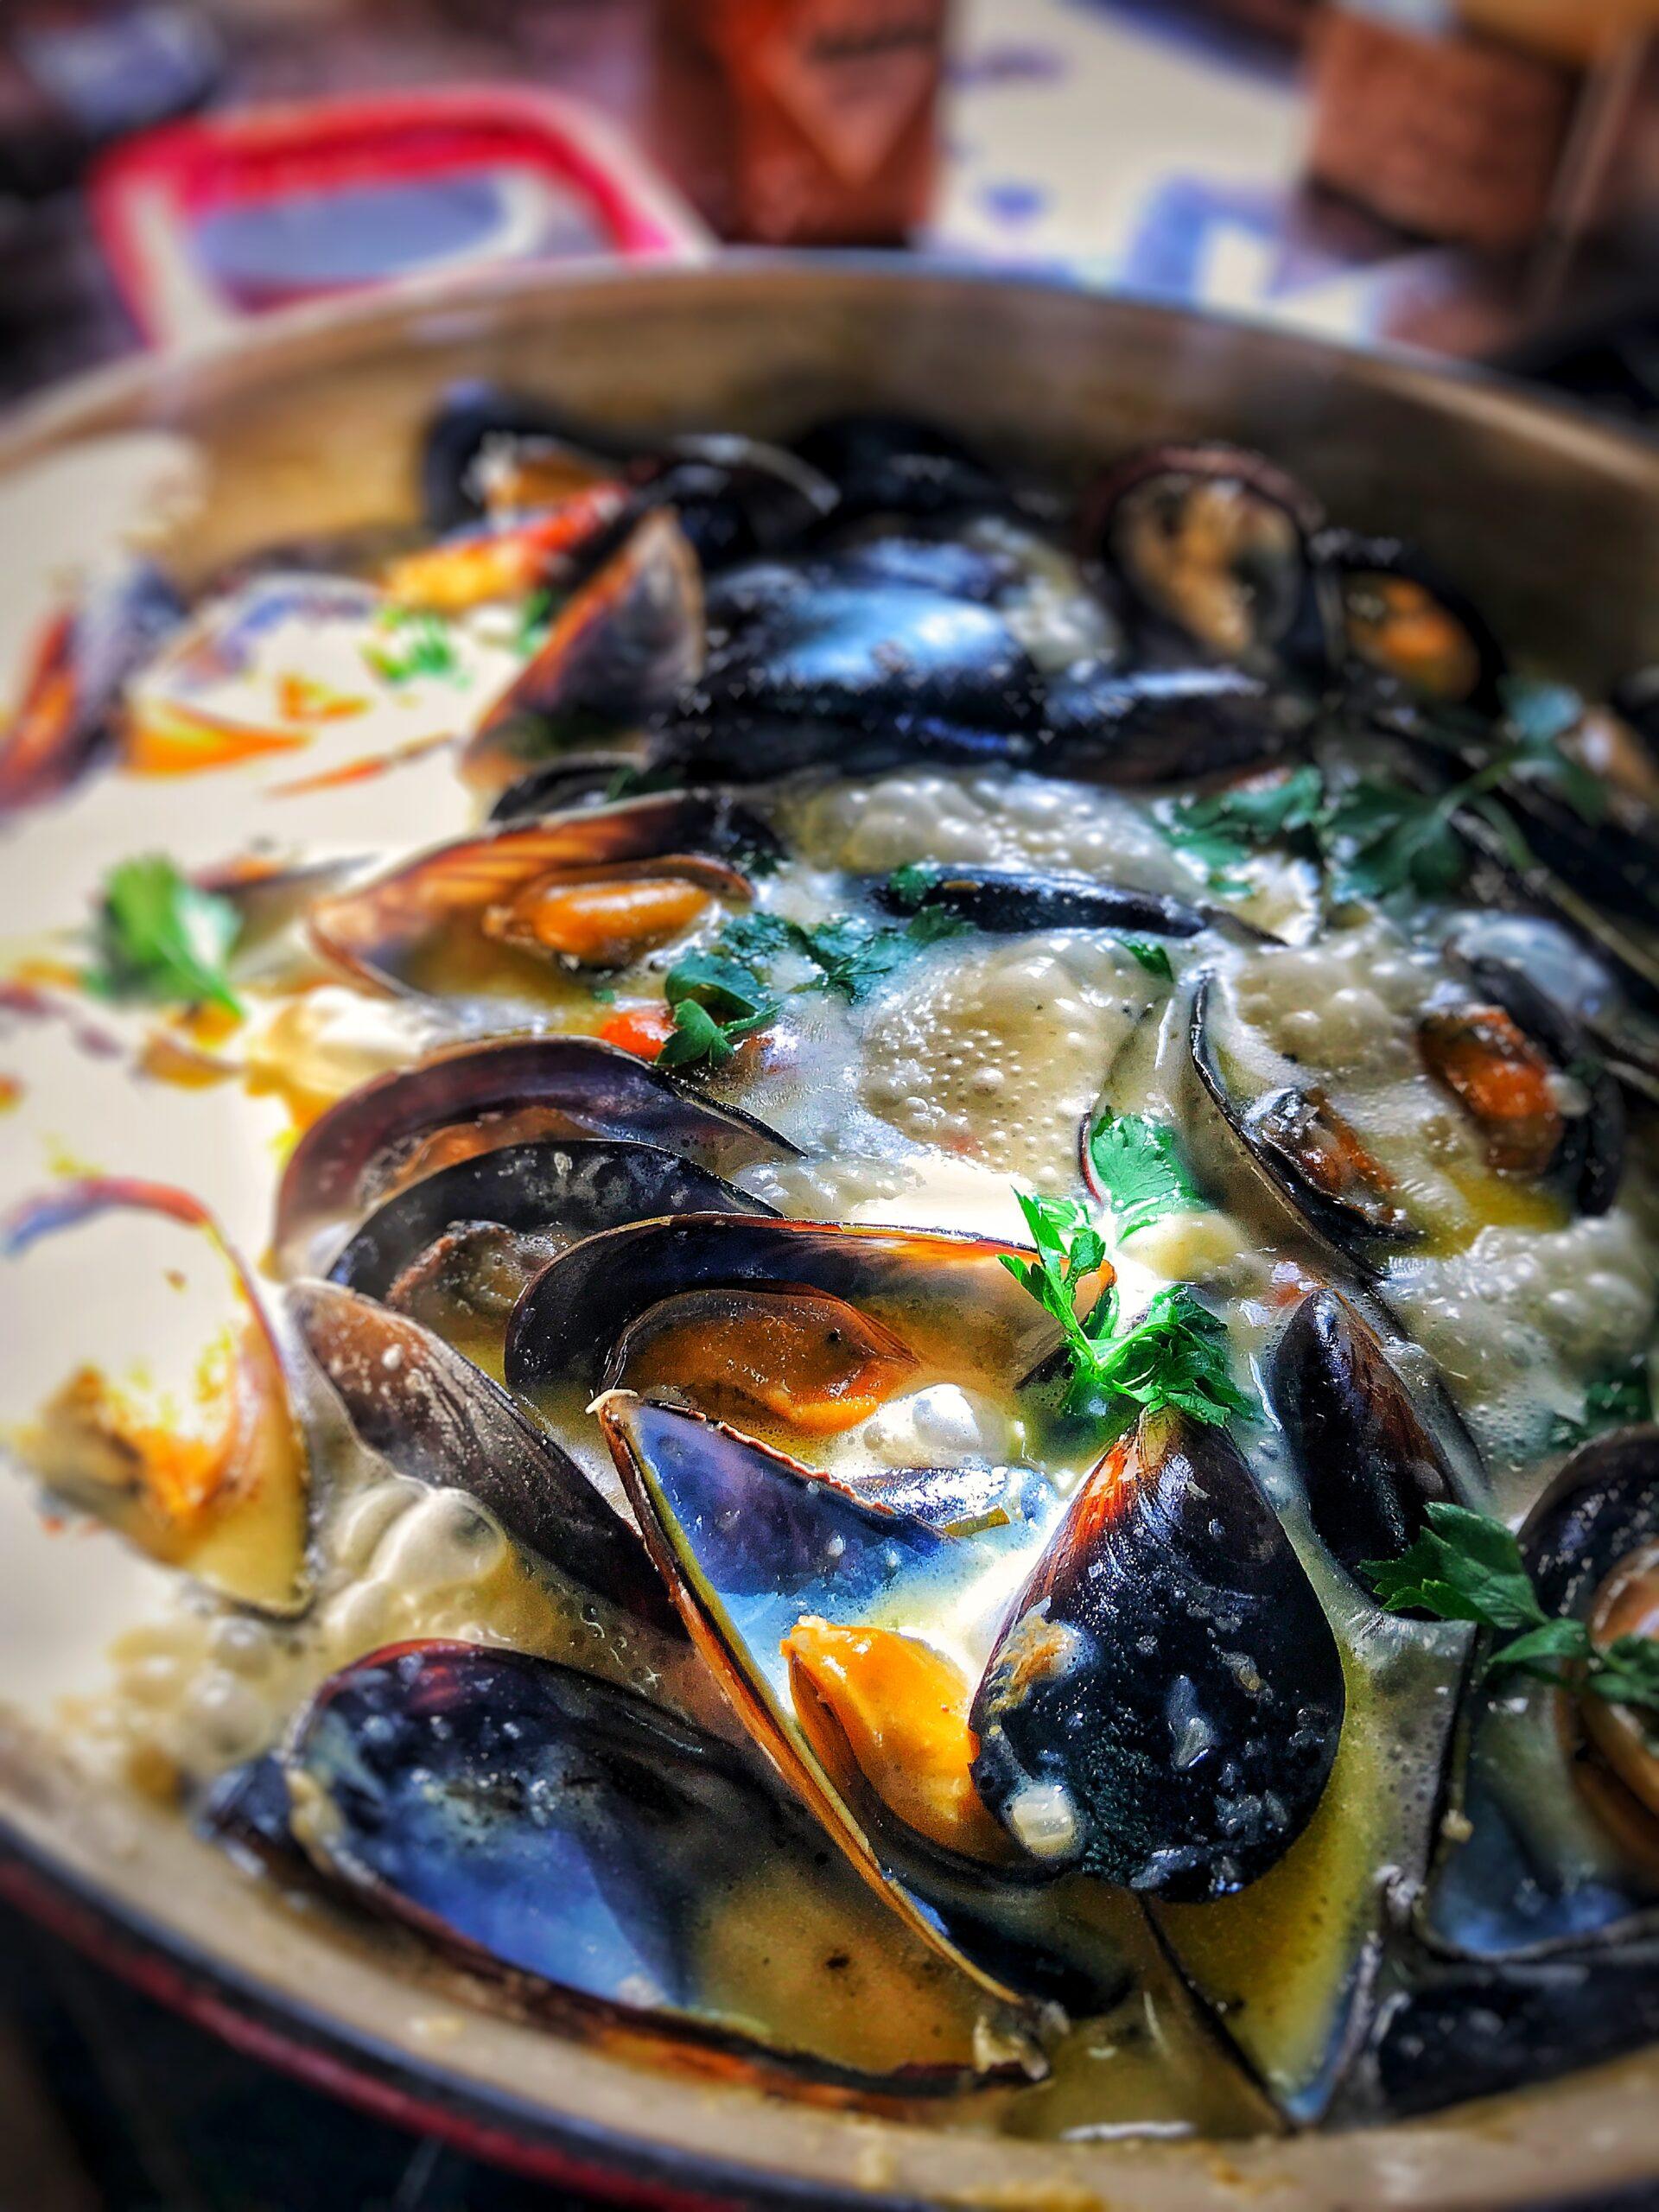 Mussels in Creamy Garlic Sauce